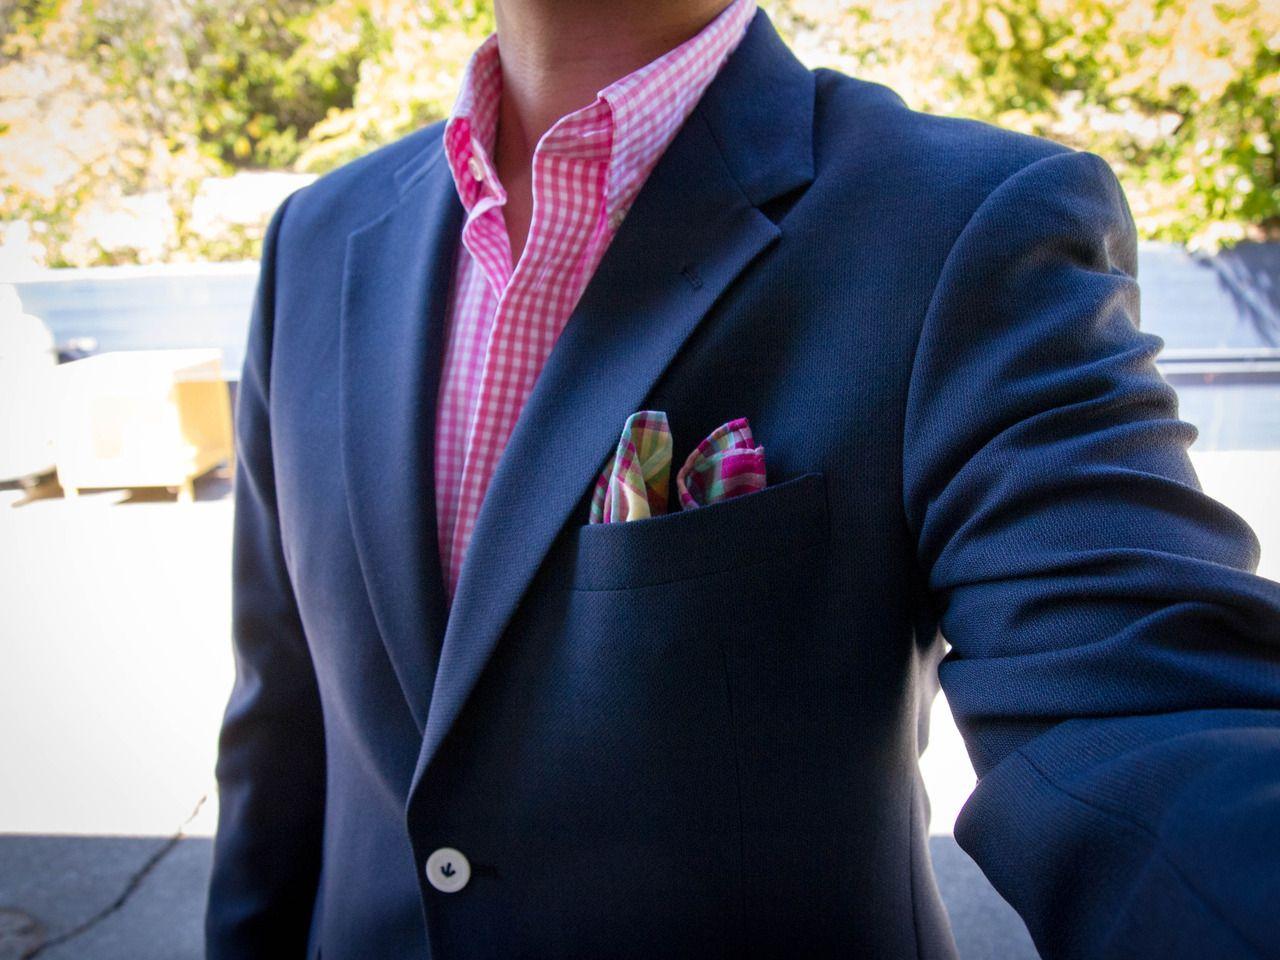 Mens jacket pocket handkerchief - Pink Gingham Shirt And Colourful Pocket Square